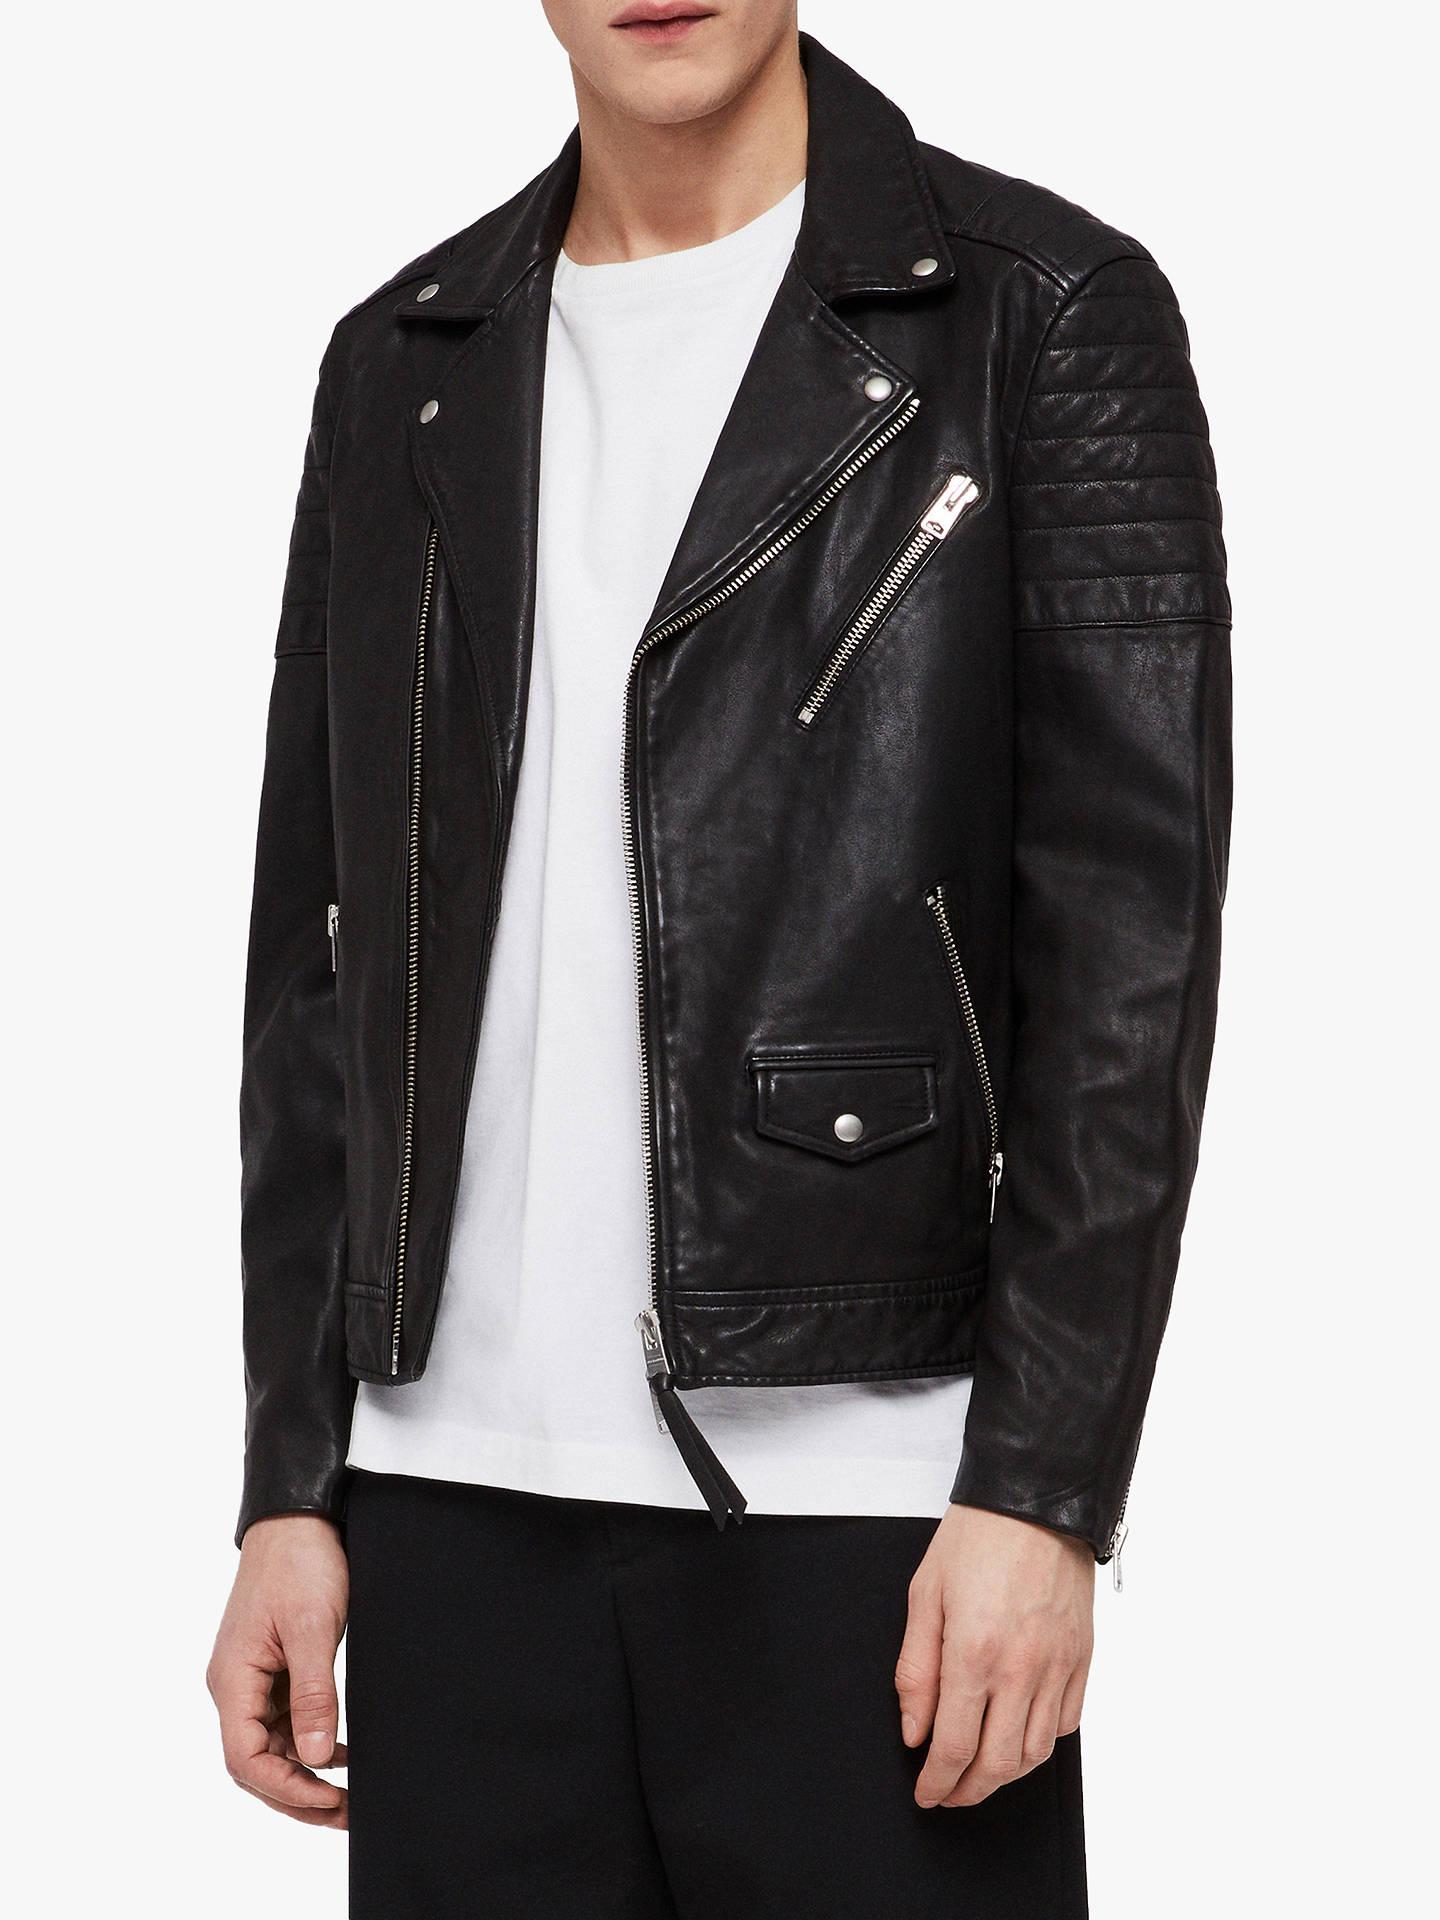 65852f4b4c4 Buy AllSaints Leo Leather Biker Jacket